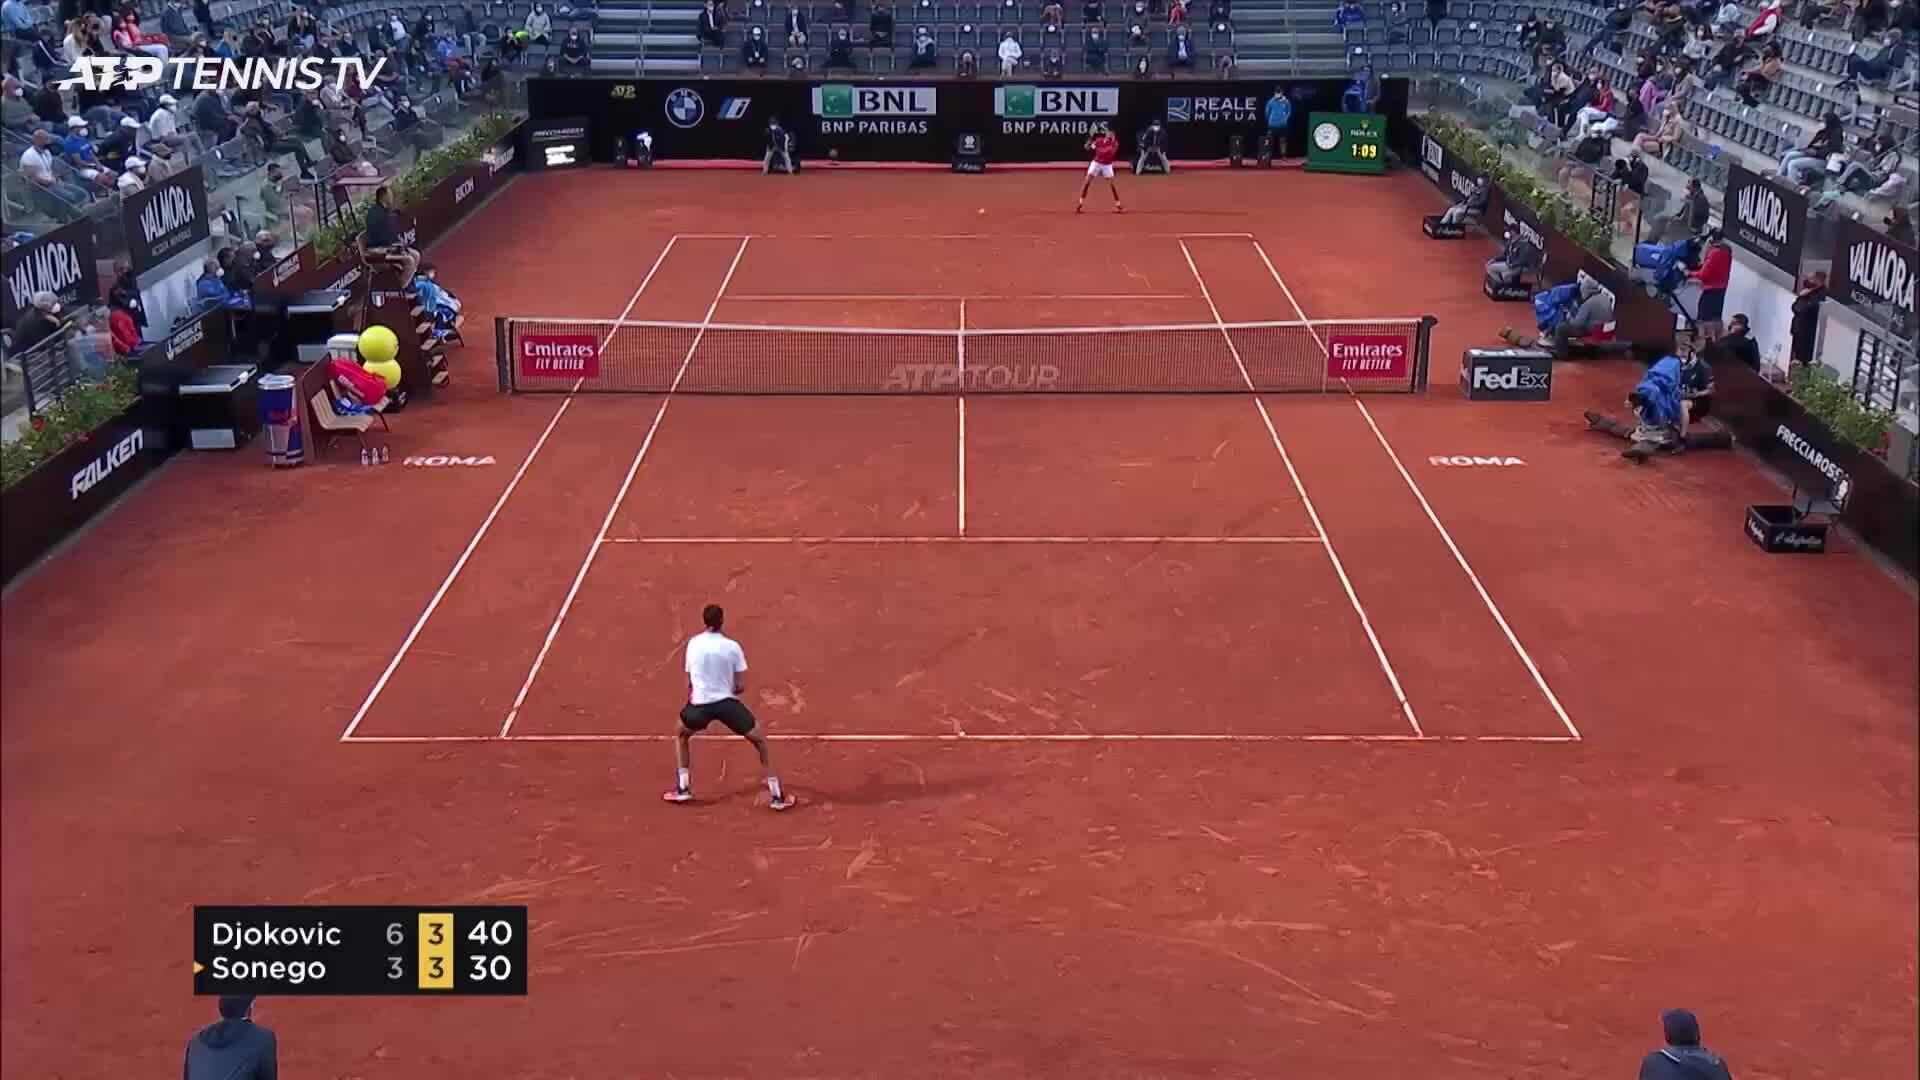 Djokovic 2-1 Sonego